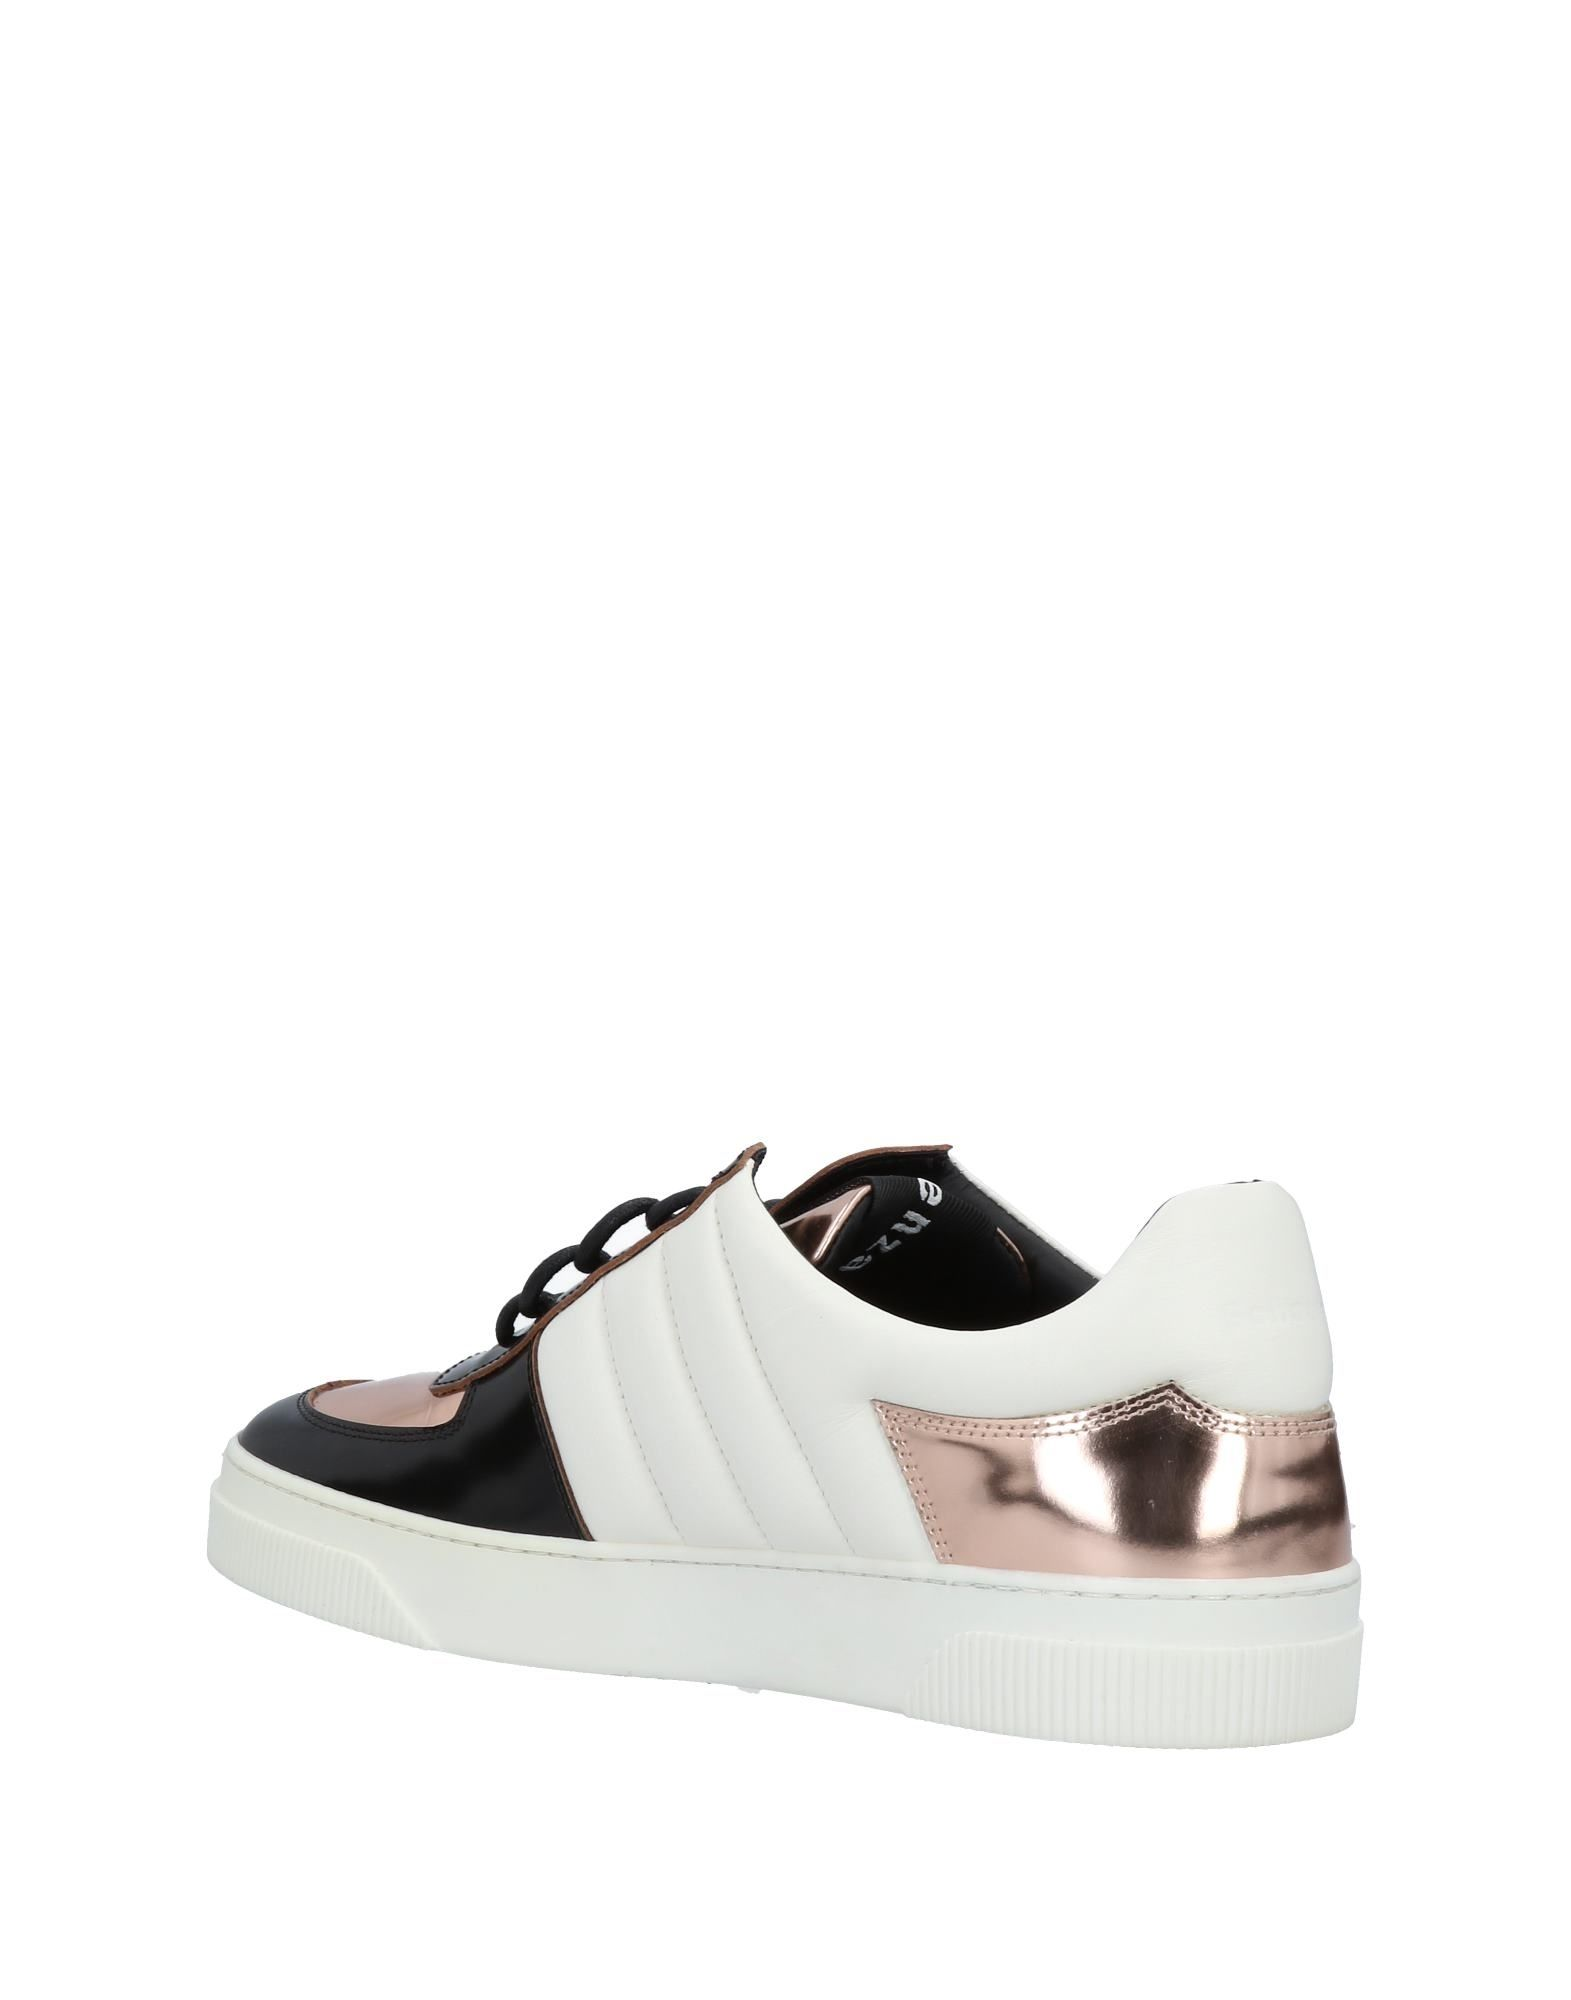 Rabatt Schuhe Sneakers Proenza Schouler Sneakers Schuhe Damen  11494701CJ 6e861d